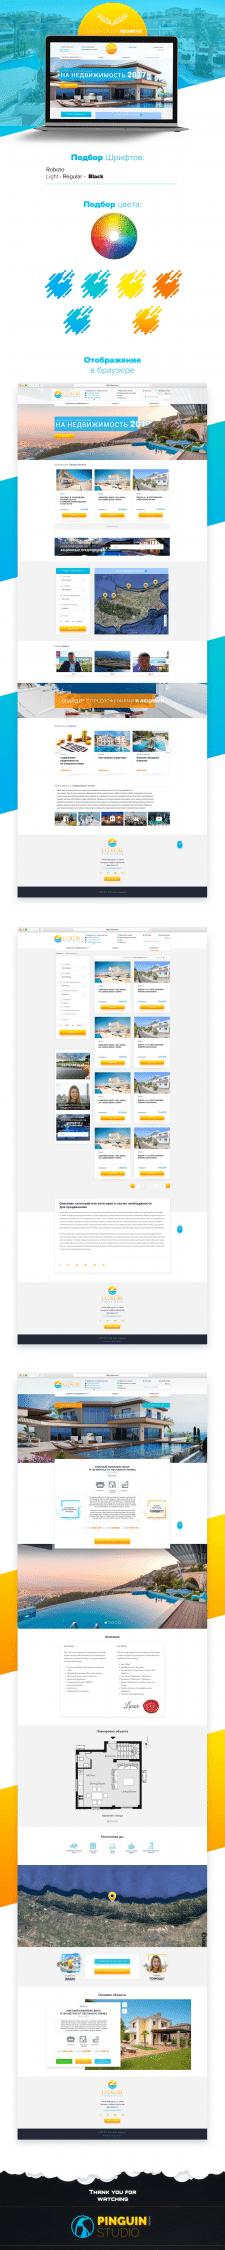 Luxor - корпоративный сайт недвижимости